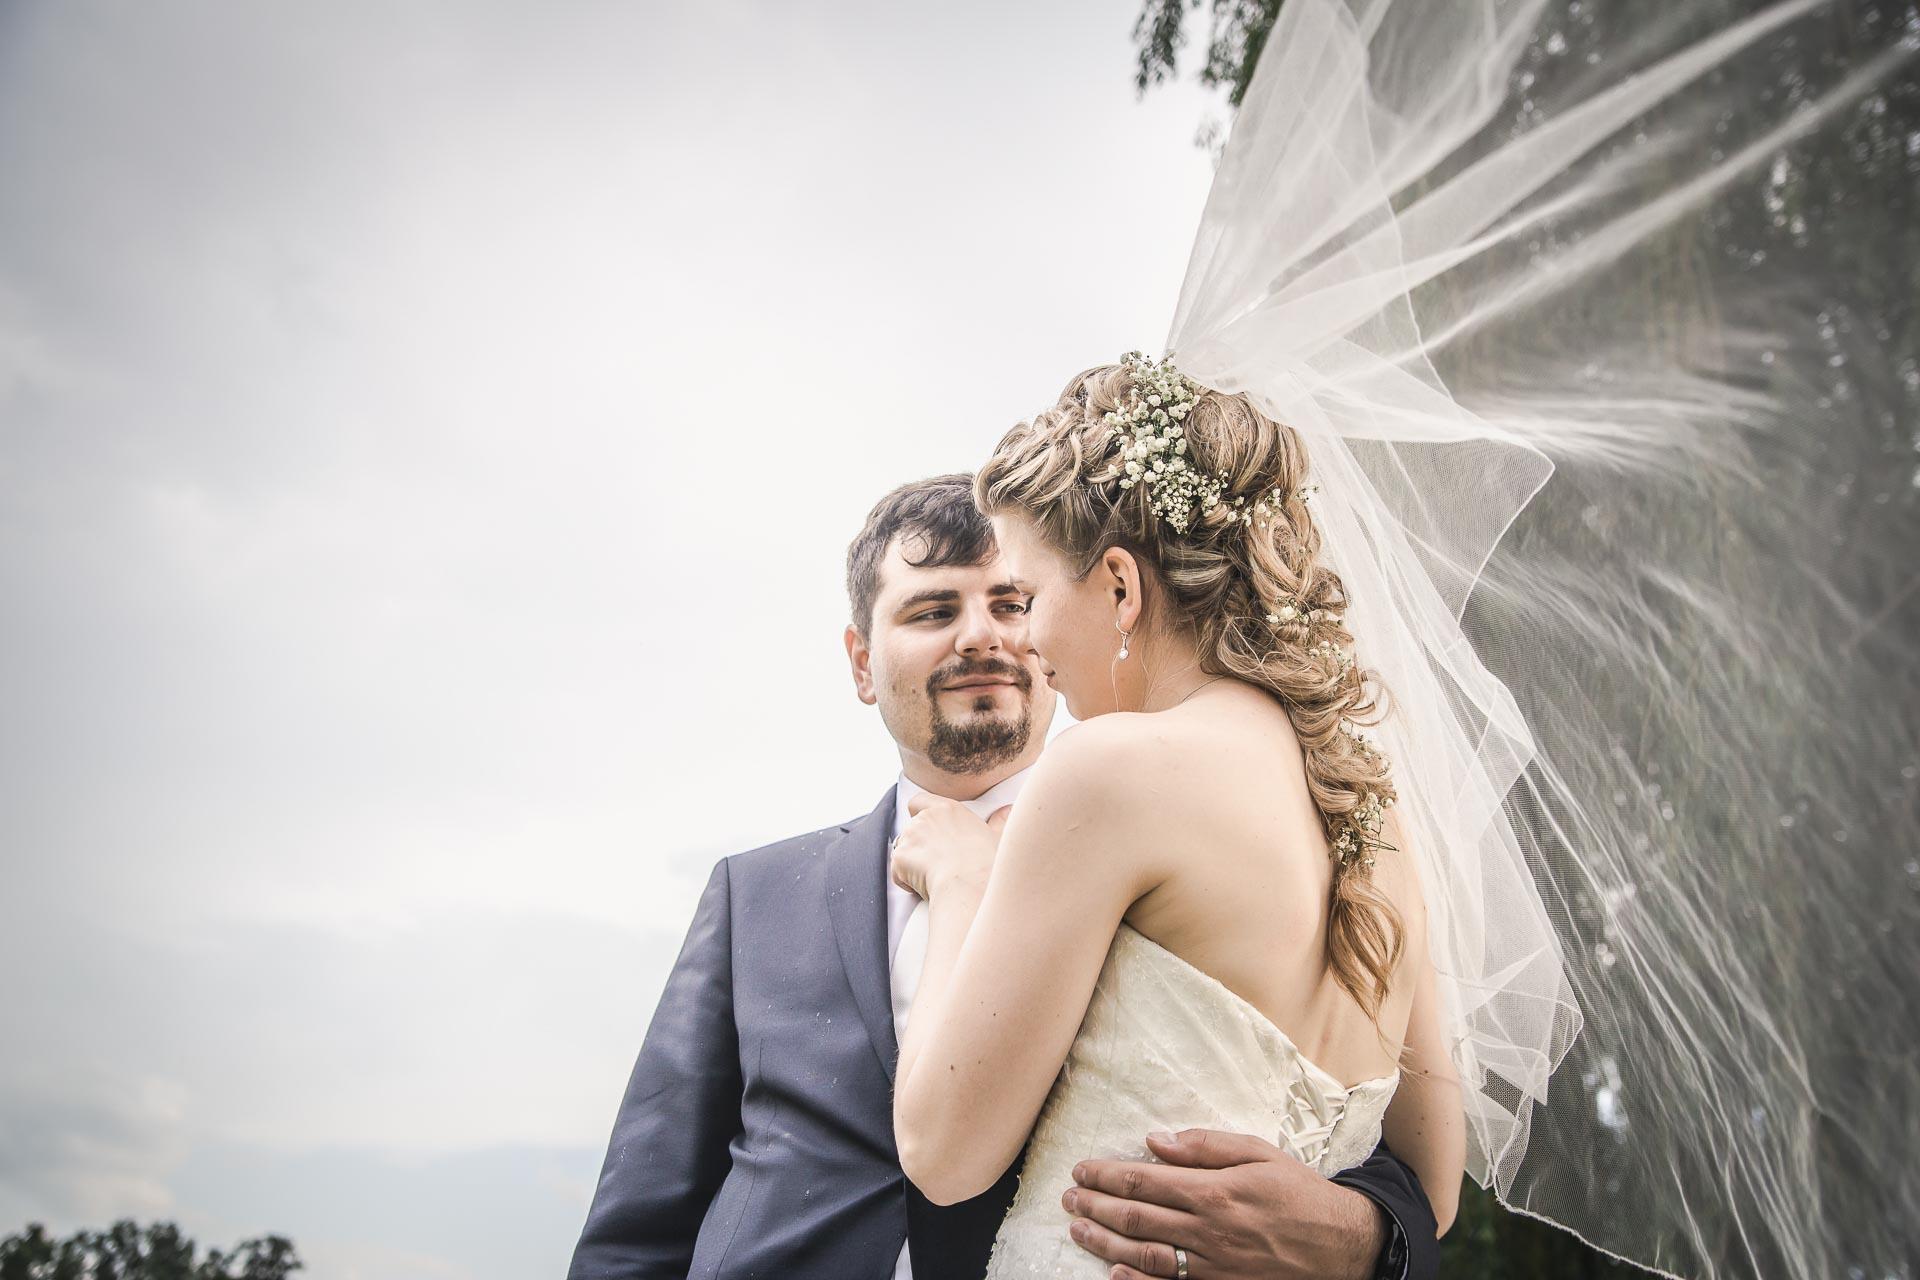 Svatební-fotograf-Nymburk-6306